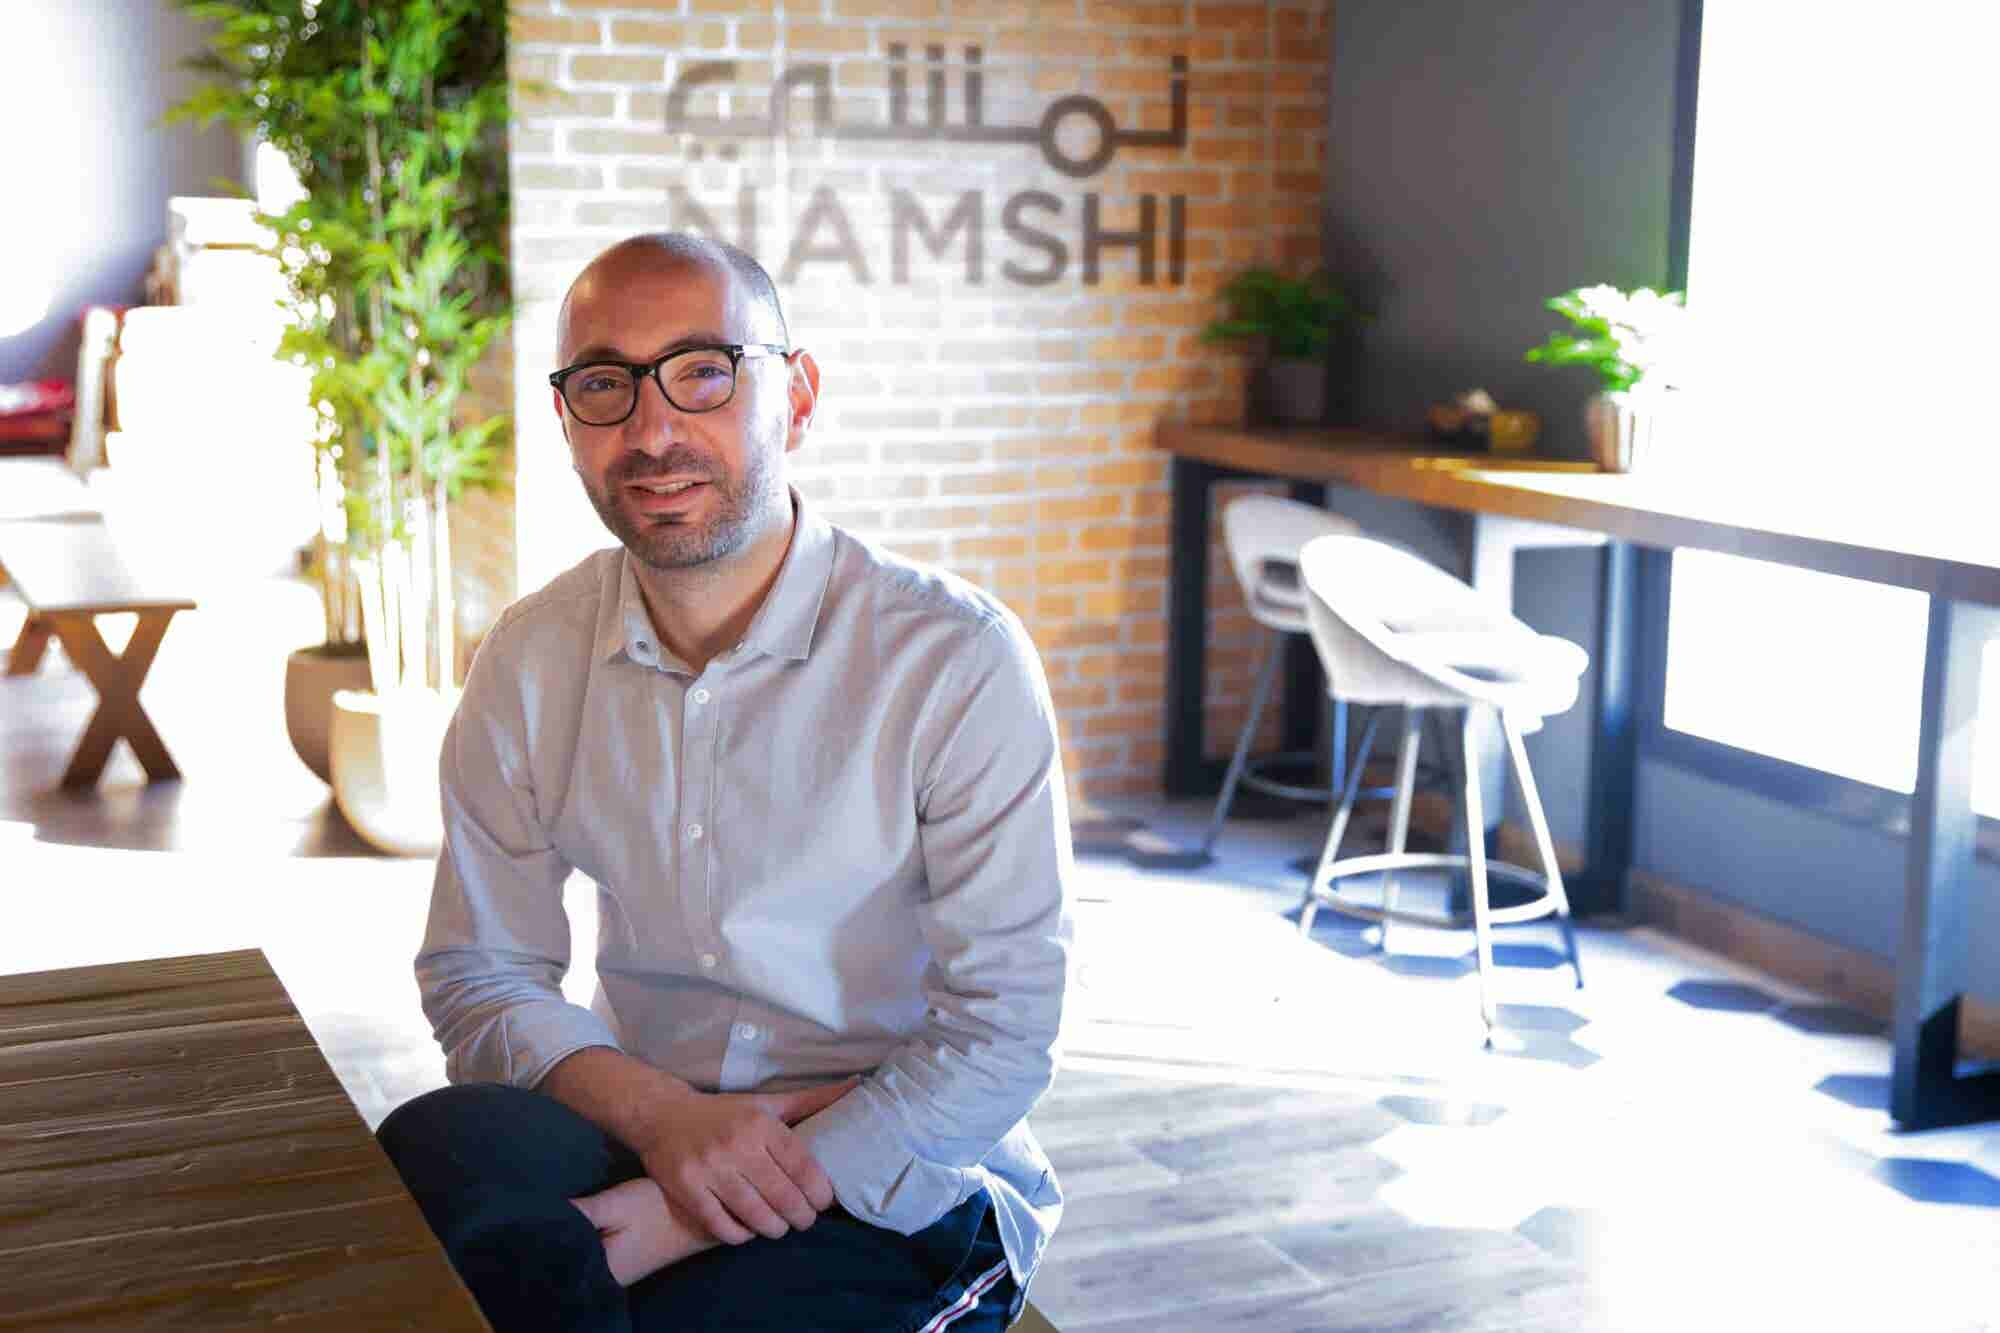 Moving On: Namshi Co-Founder Hosam Arab Steps Down As CEO Of The E-Commerce Enterprise